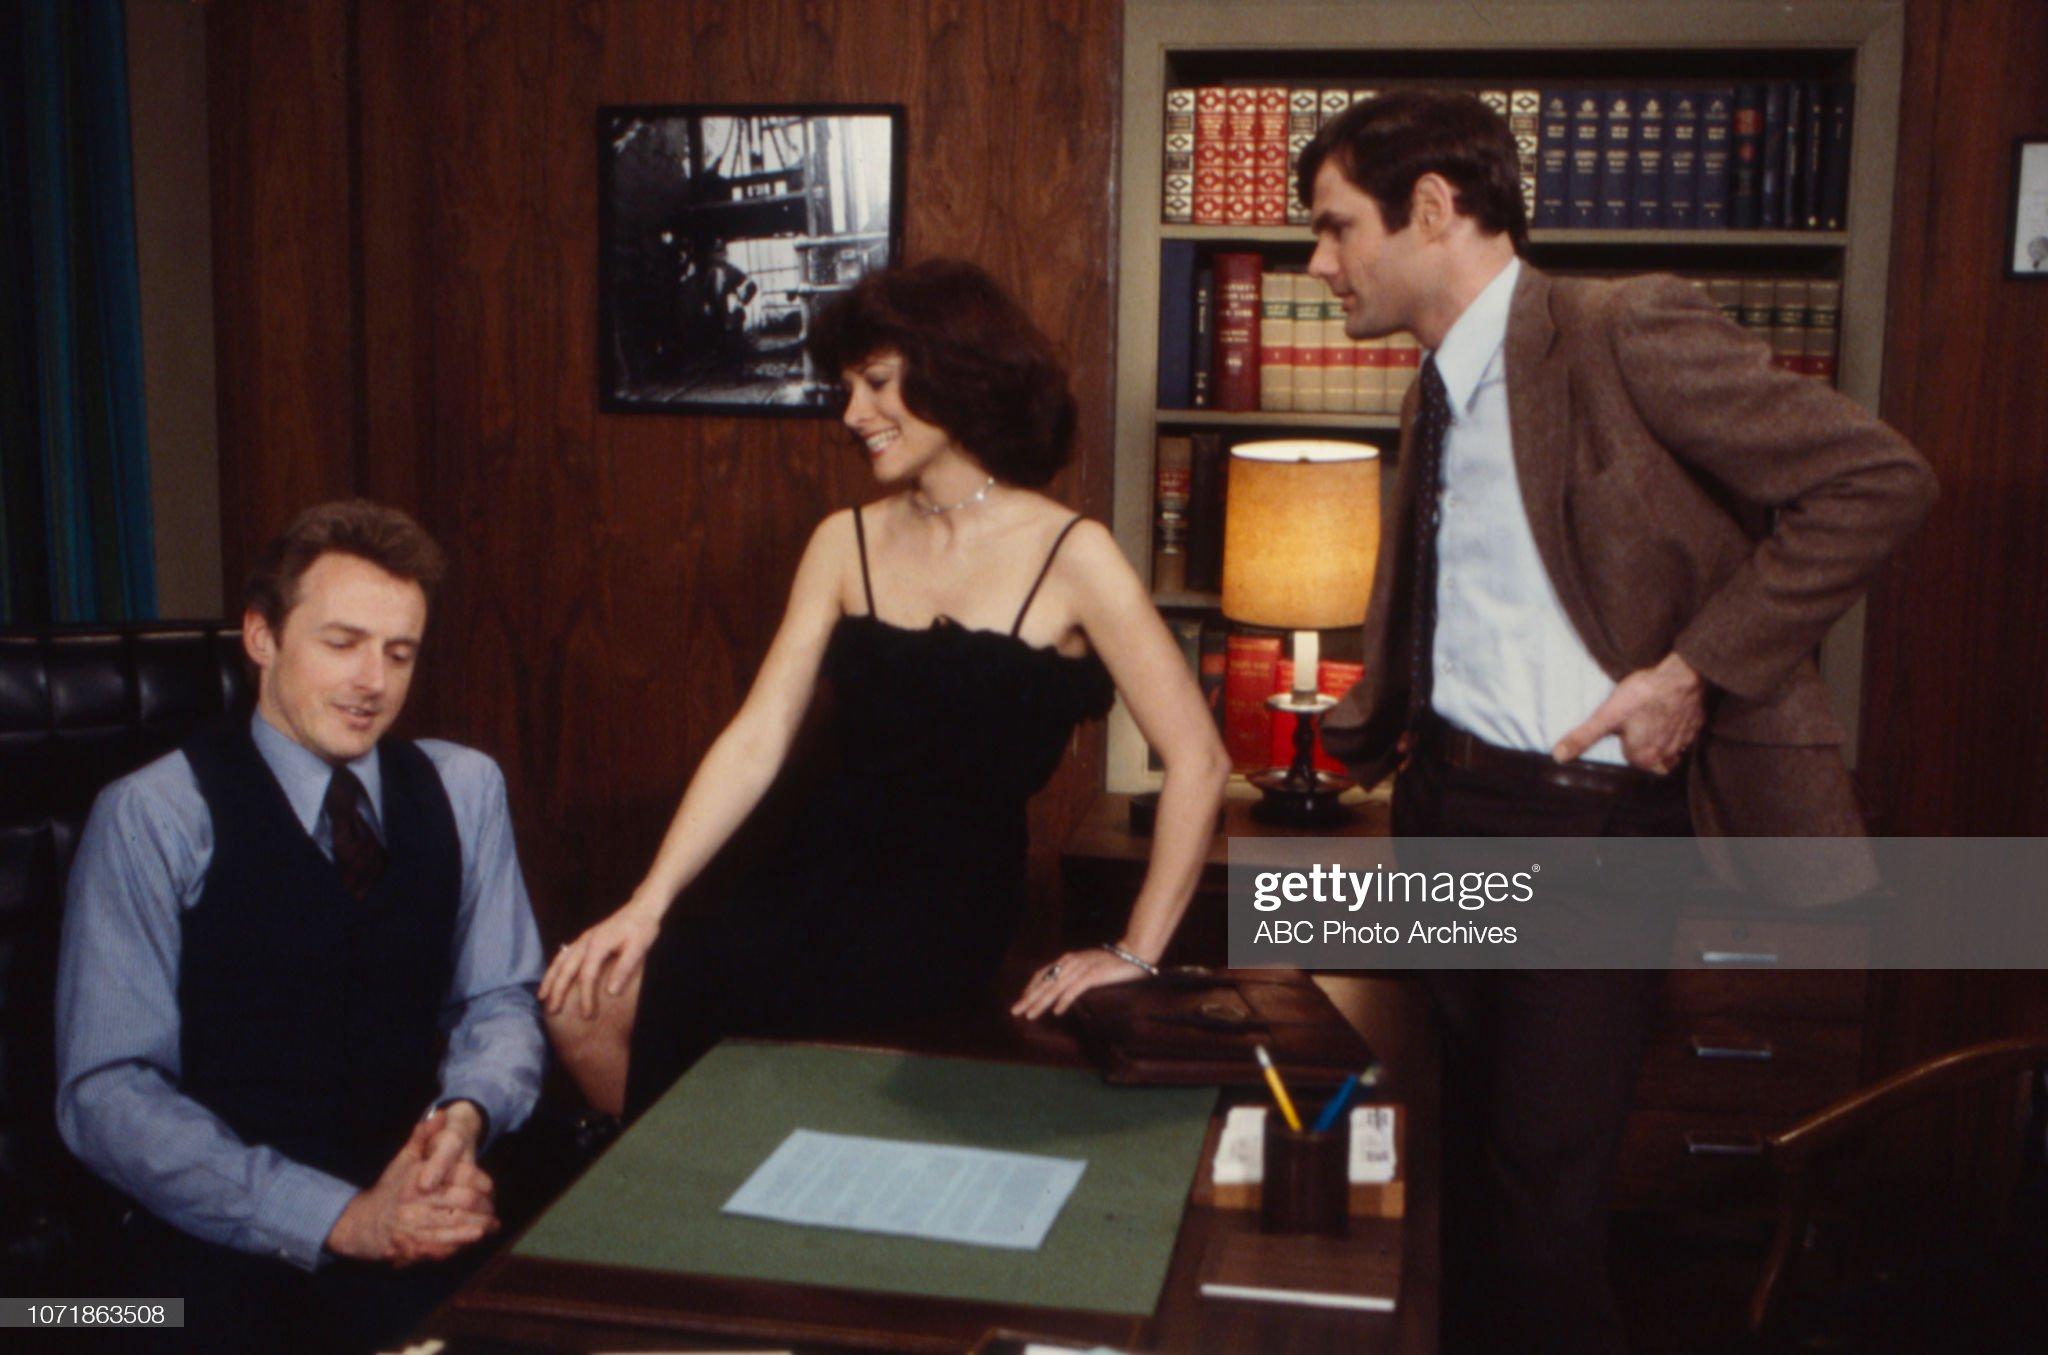 Joe Lambie, Sharon Gabet, Cliff Nelson Appearing On 'Edge of Night' : News Photo